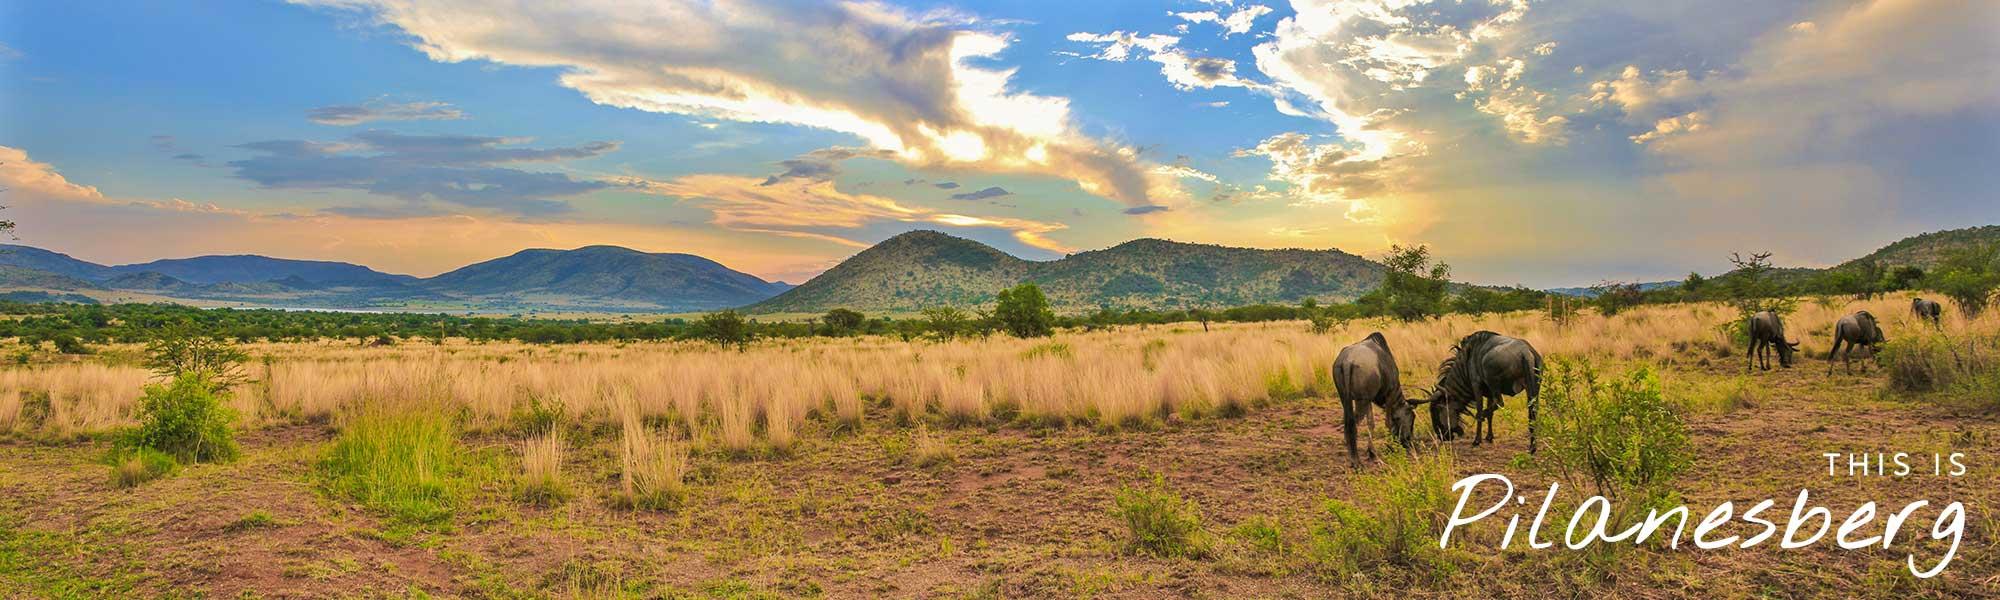 pilanesberg3.jpg